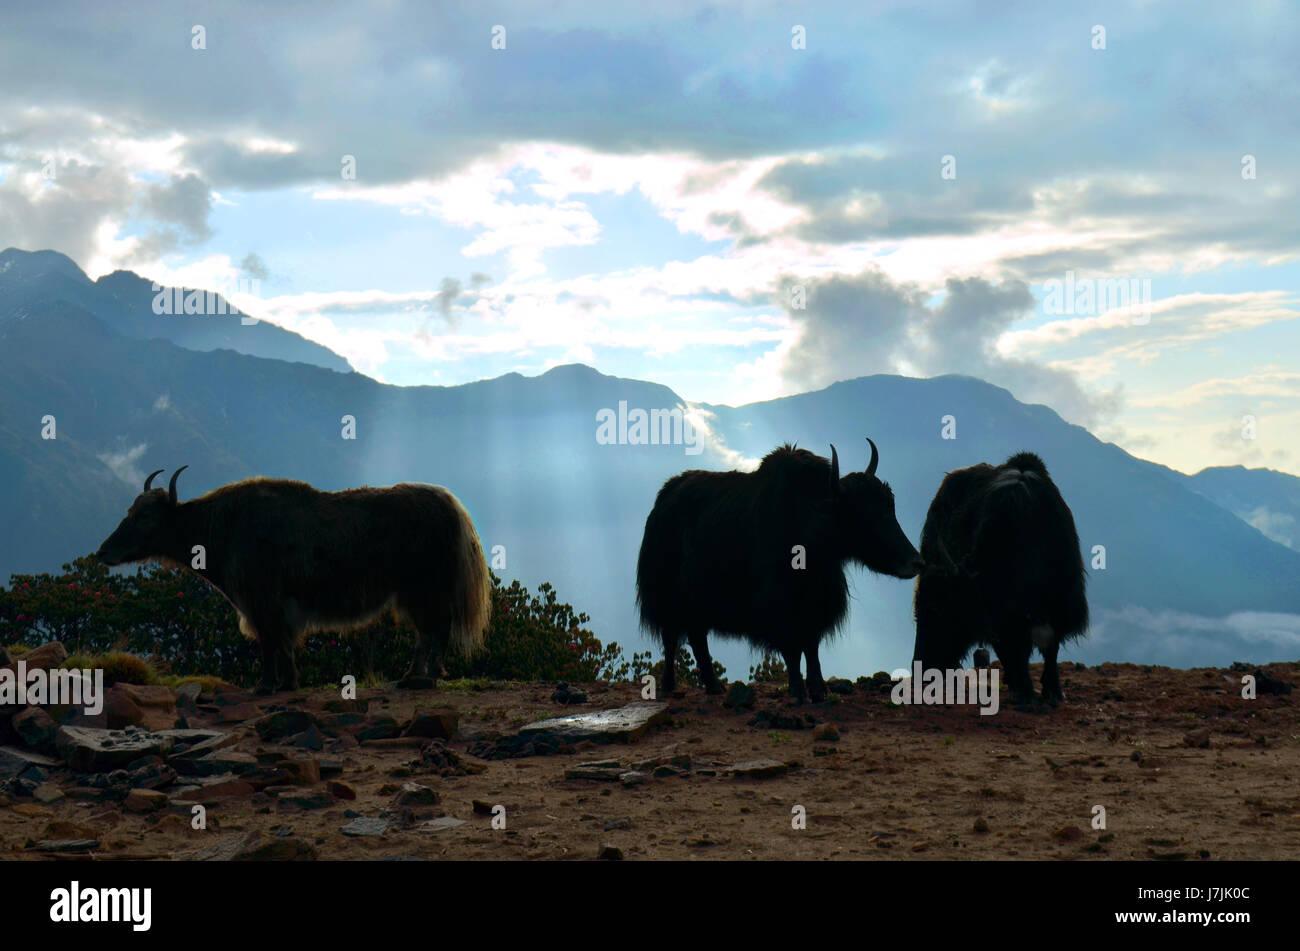 Yaks and beautiful sunrise in Himalayan mountains. Nepal, - Stock Image